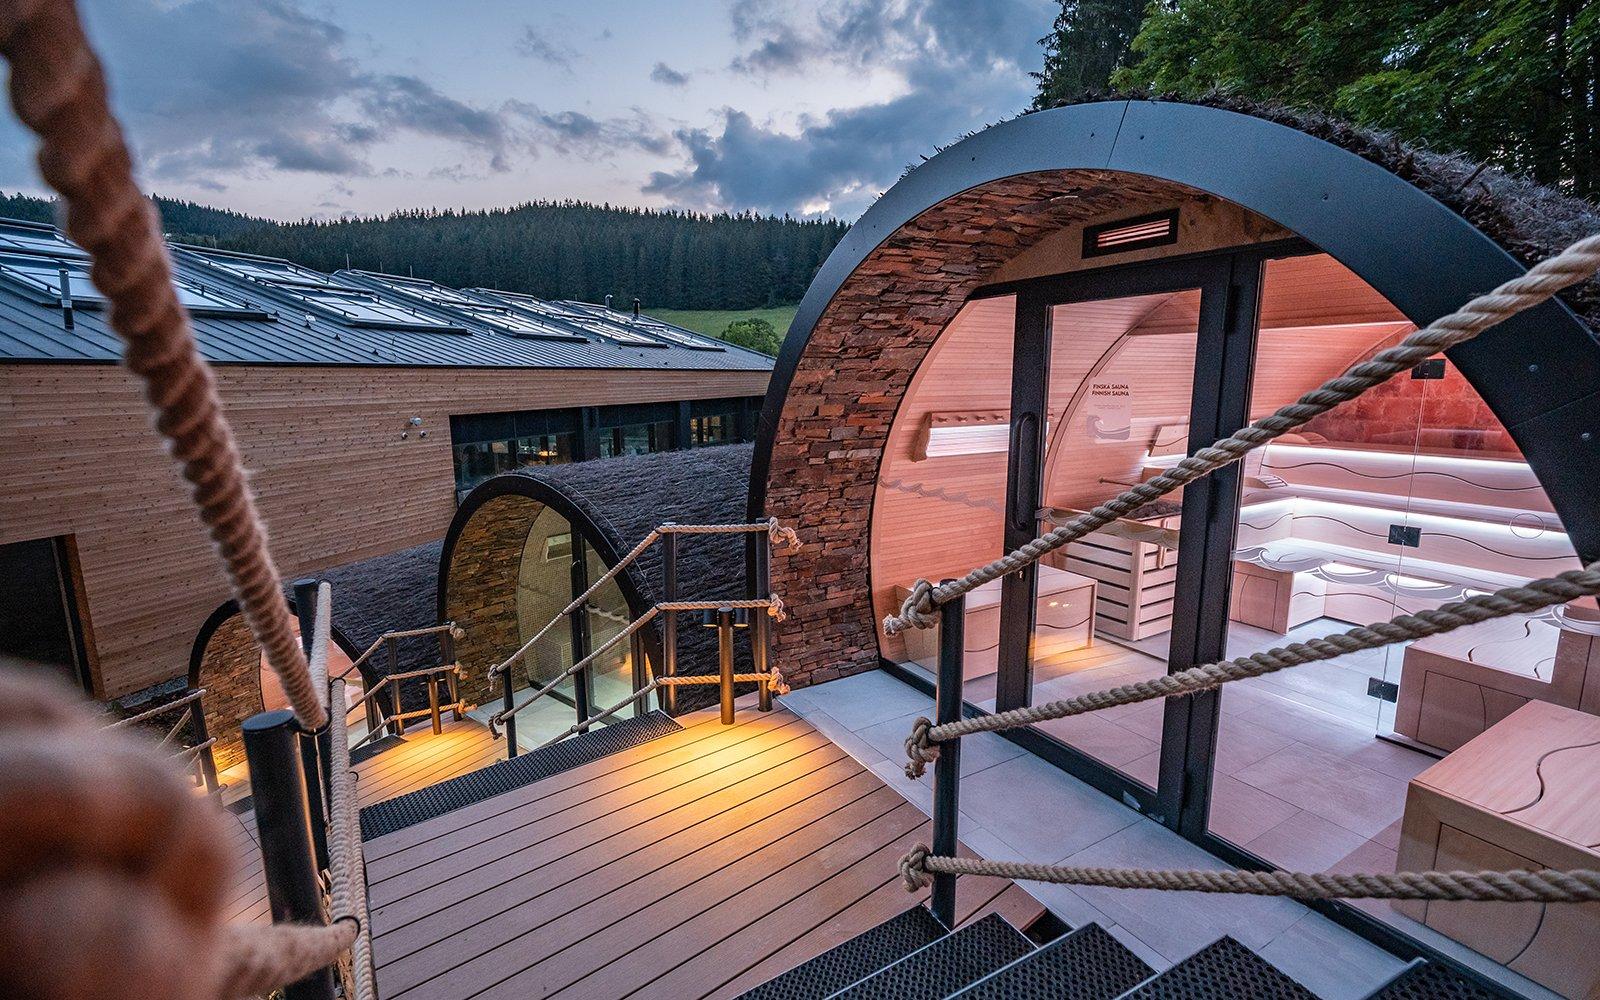 sauna's, Alpha Industries, The Art of Living